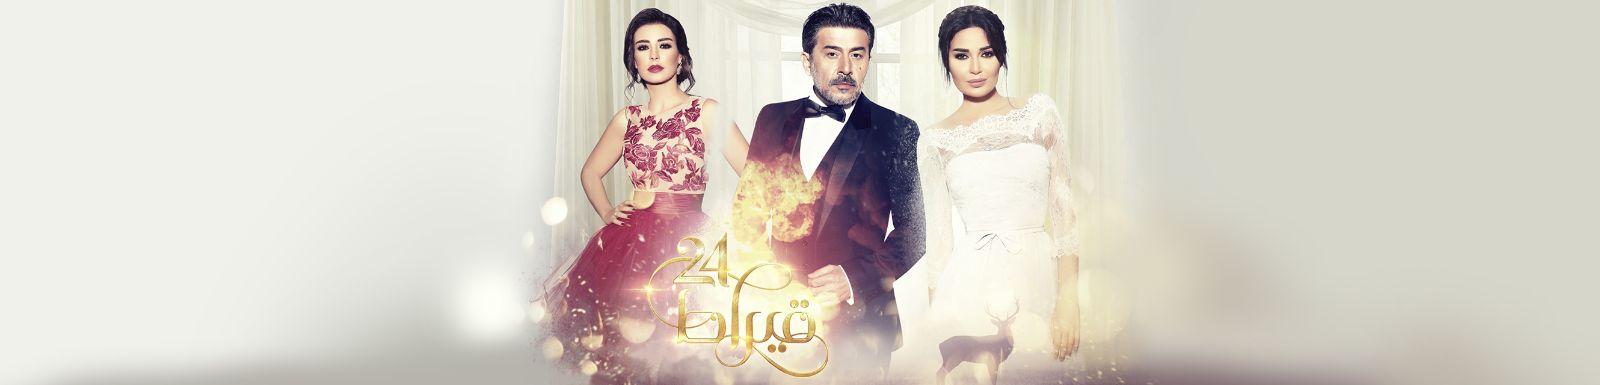 ����� ����� 24 ����� ������ 27 MBC shahid ���� ��